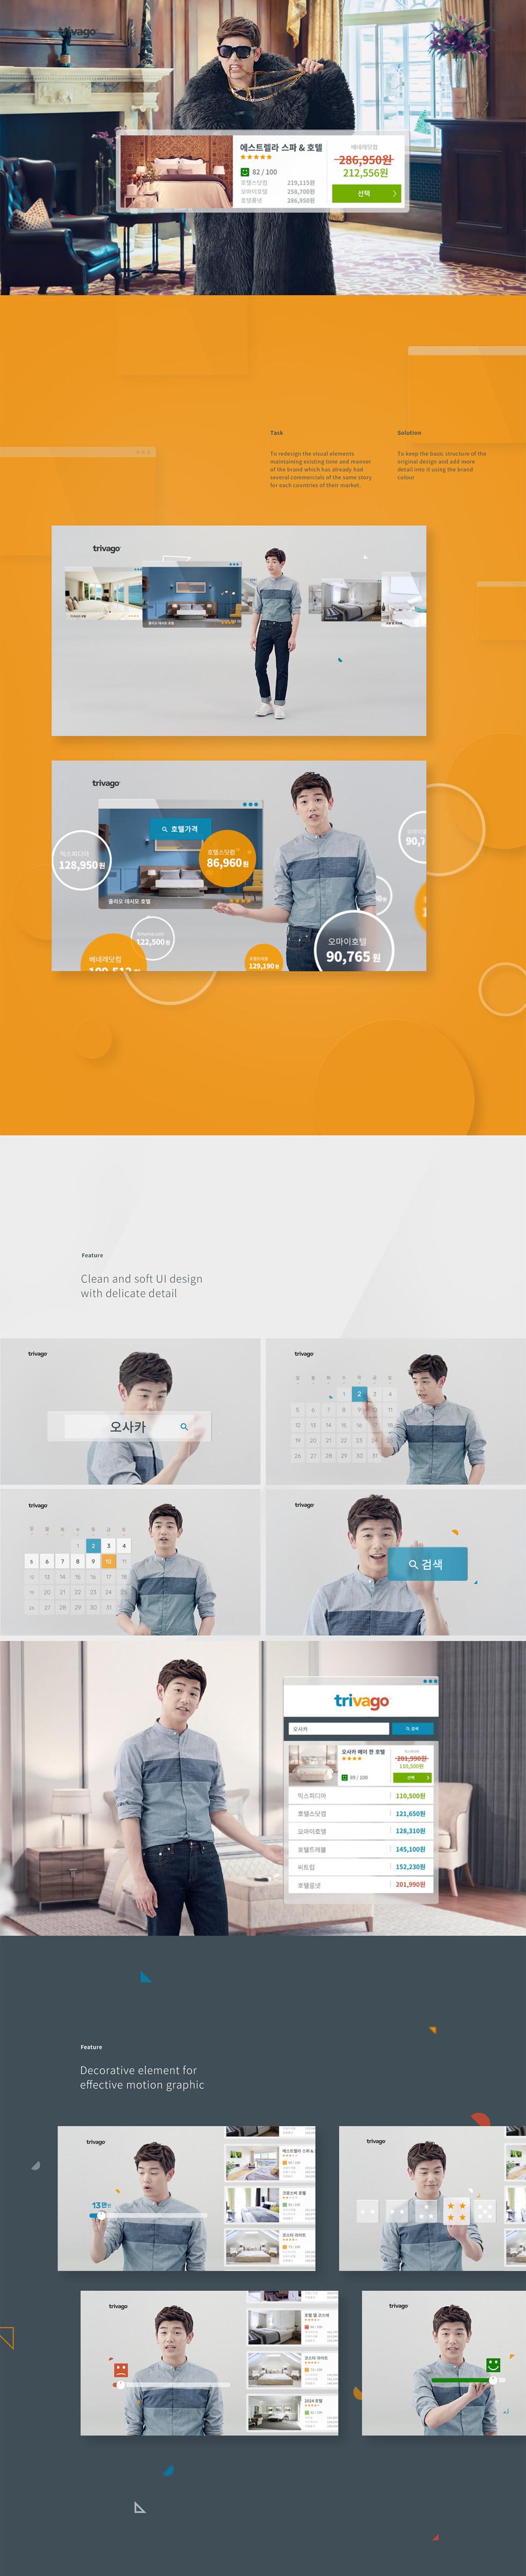 Style frame / UI design